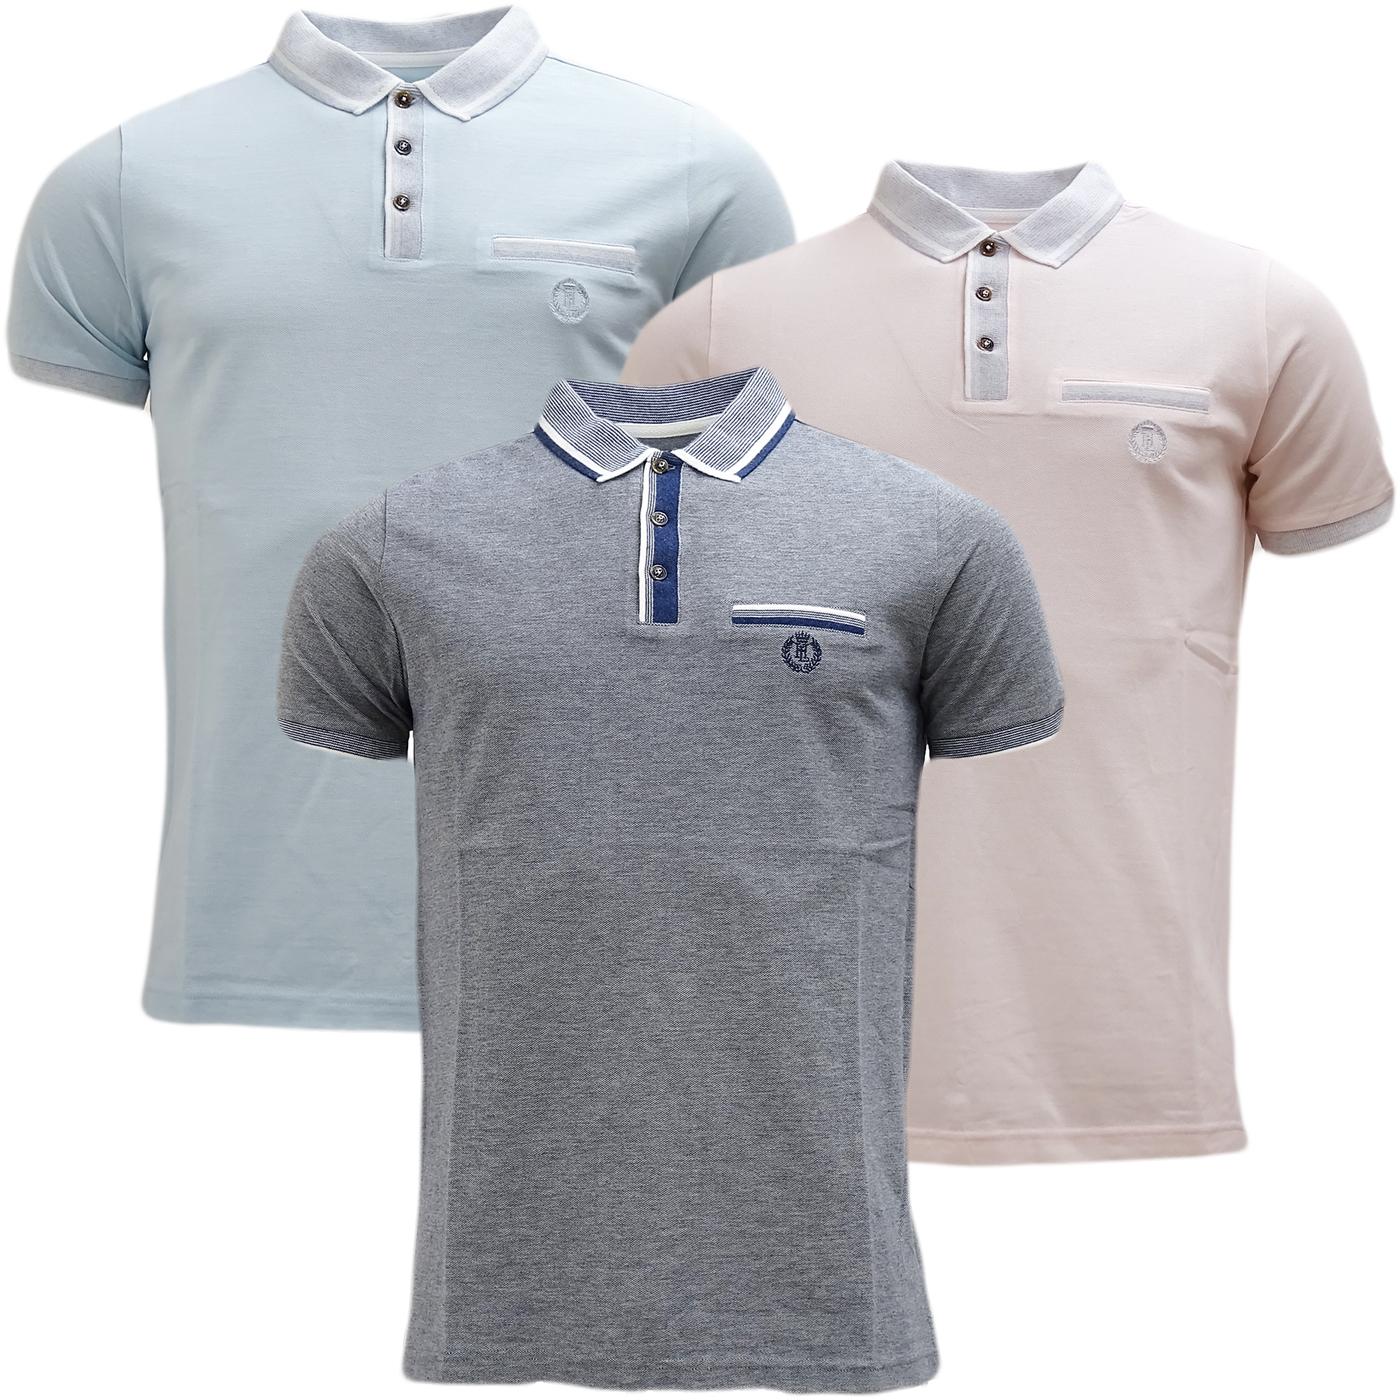 Henri Lloyd Contrast Collar / Cuffs - Pique Polo Shirt - Highland